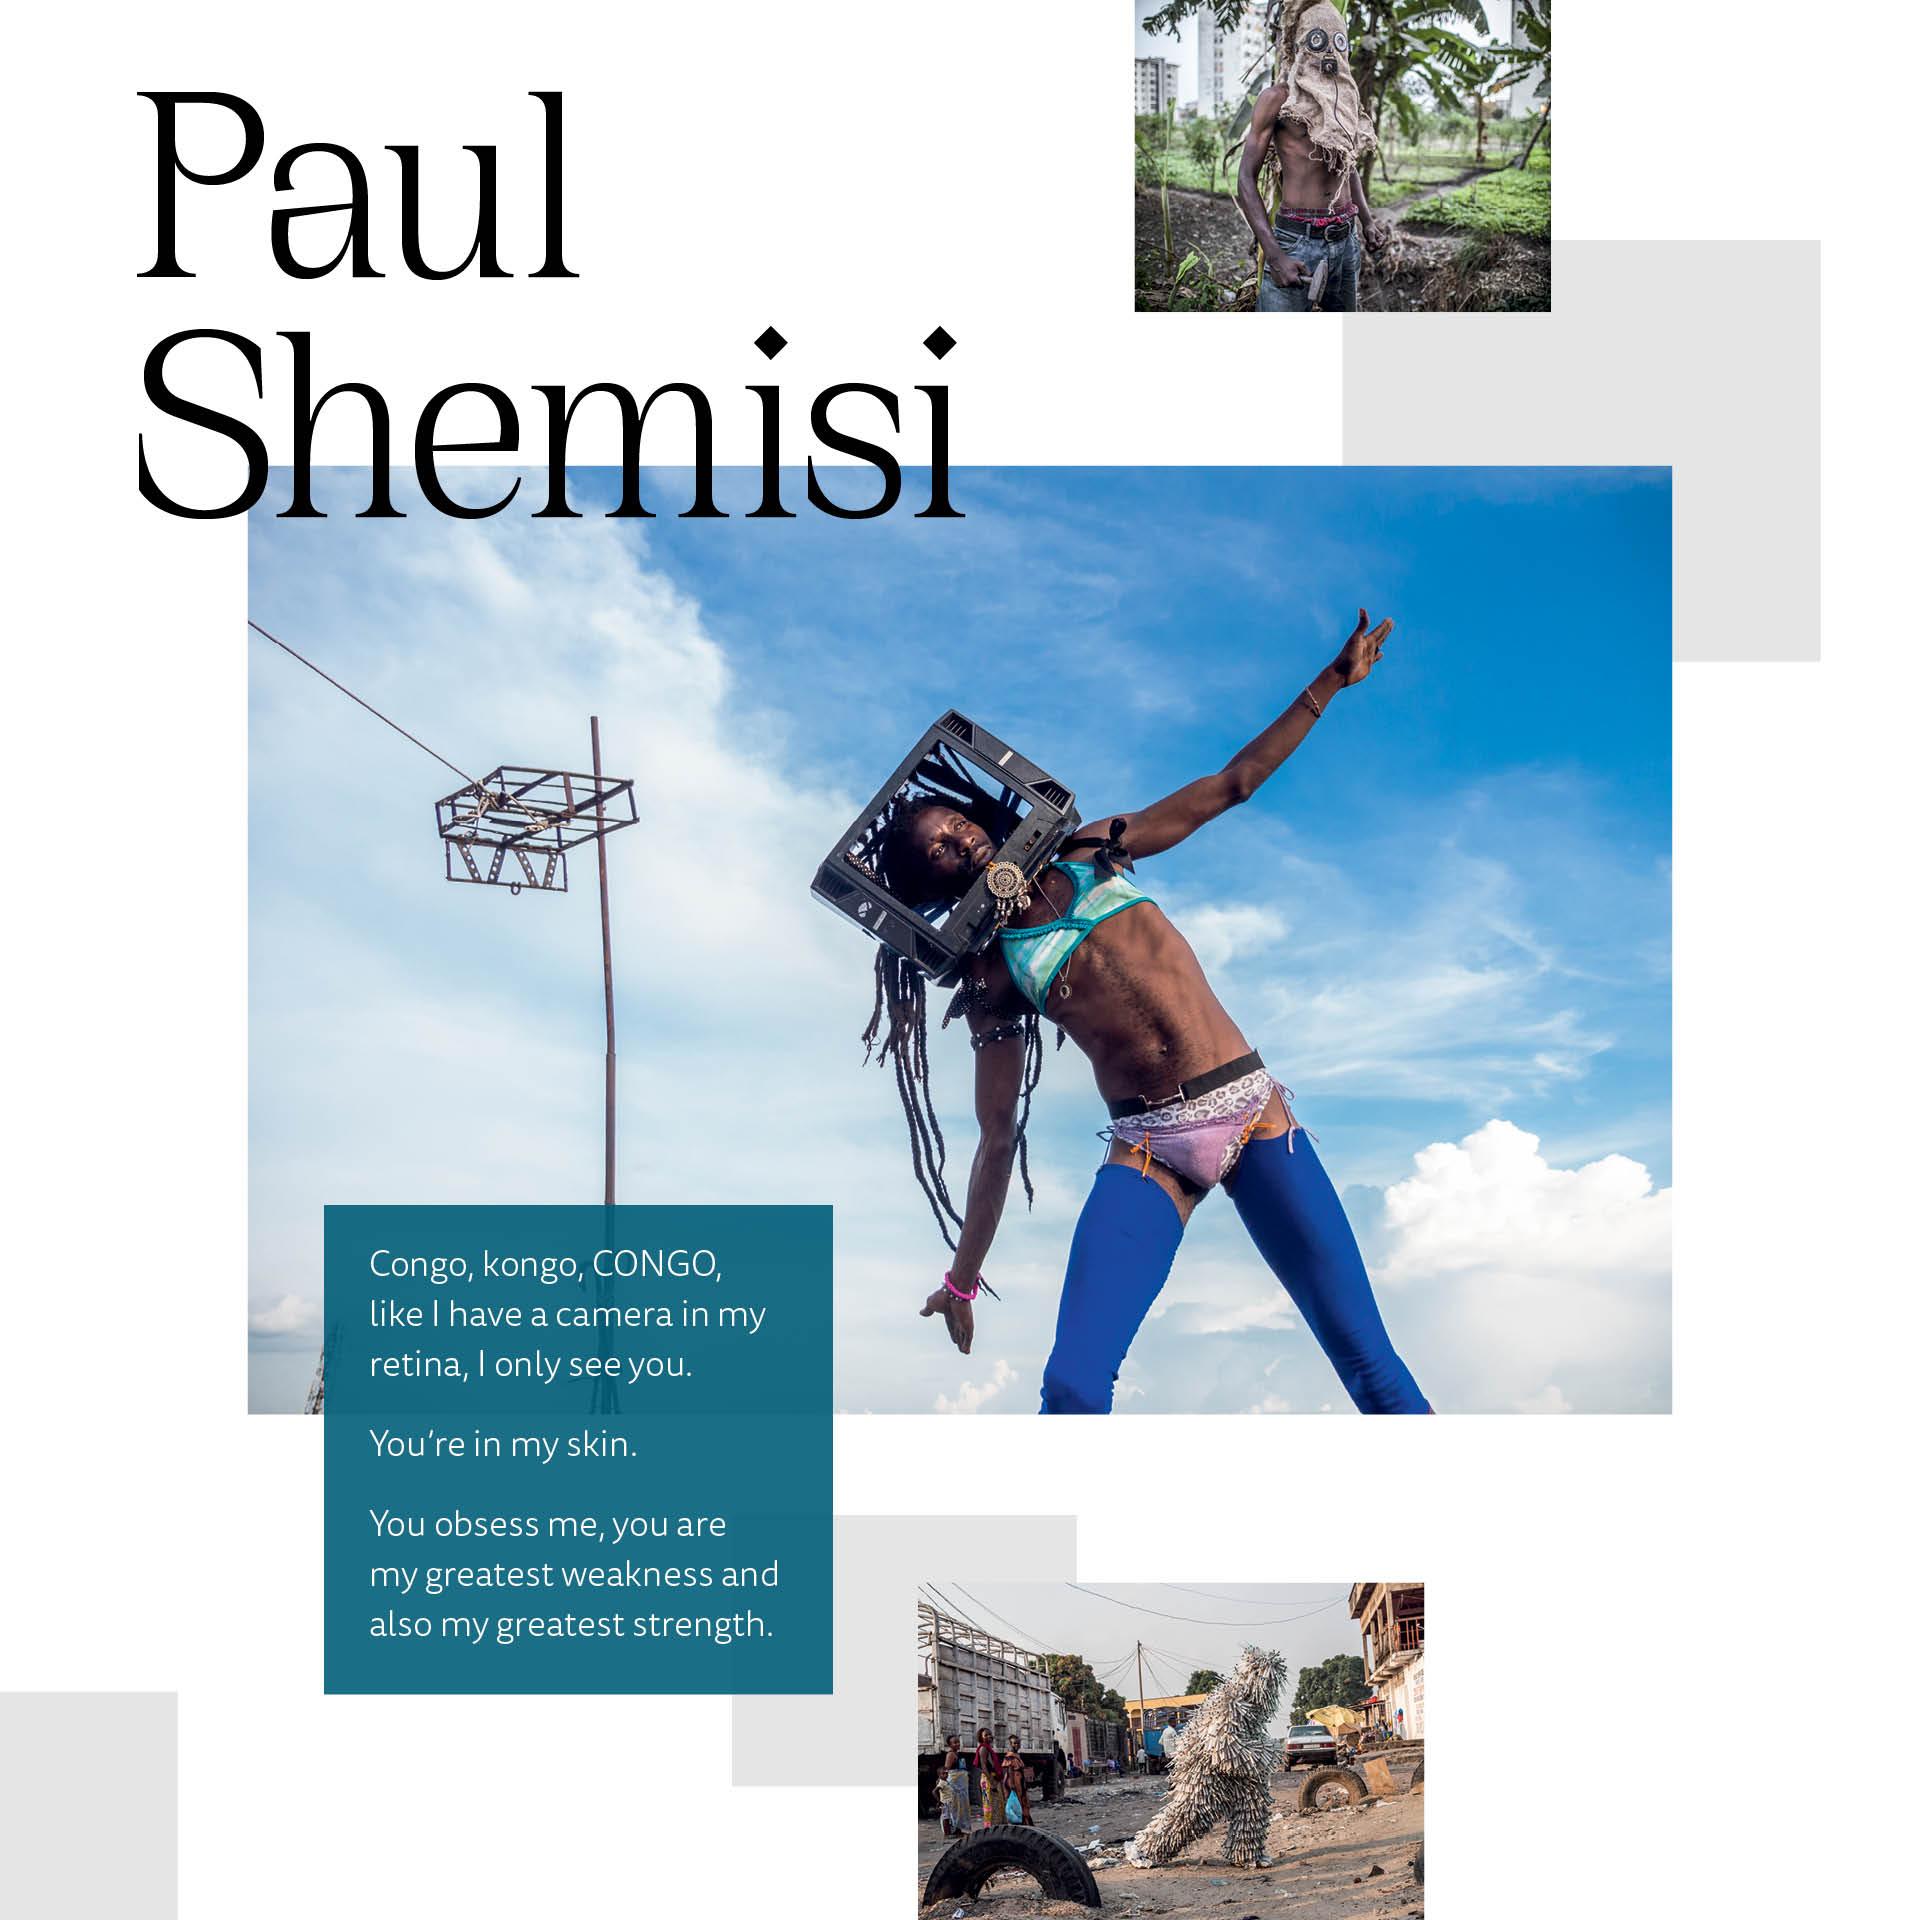 Beyond Artist Paul Shemisi